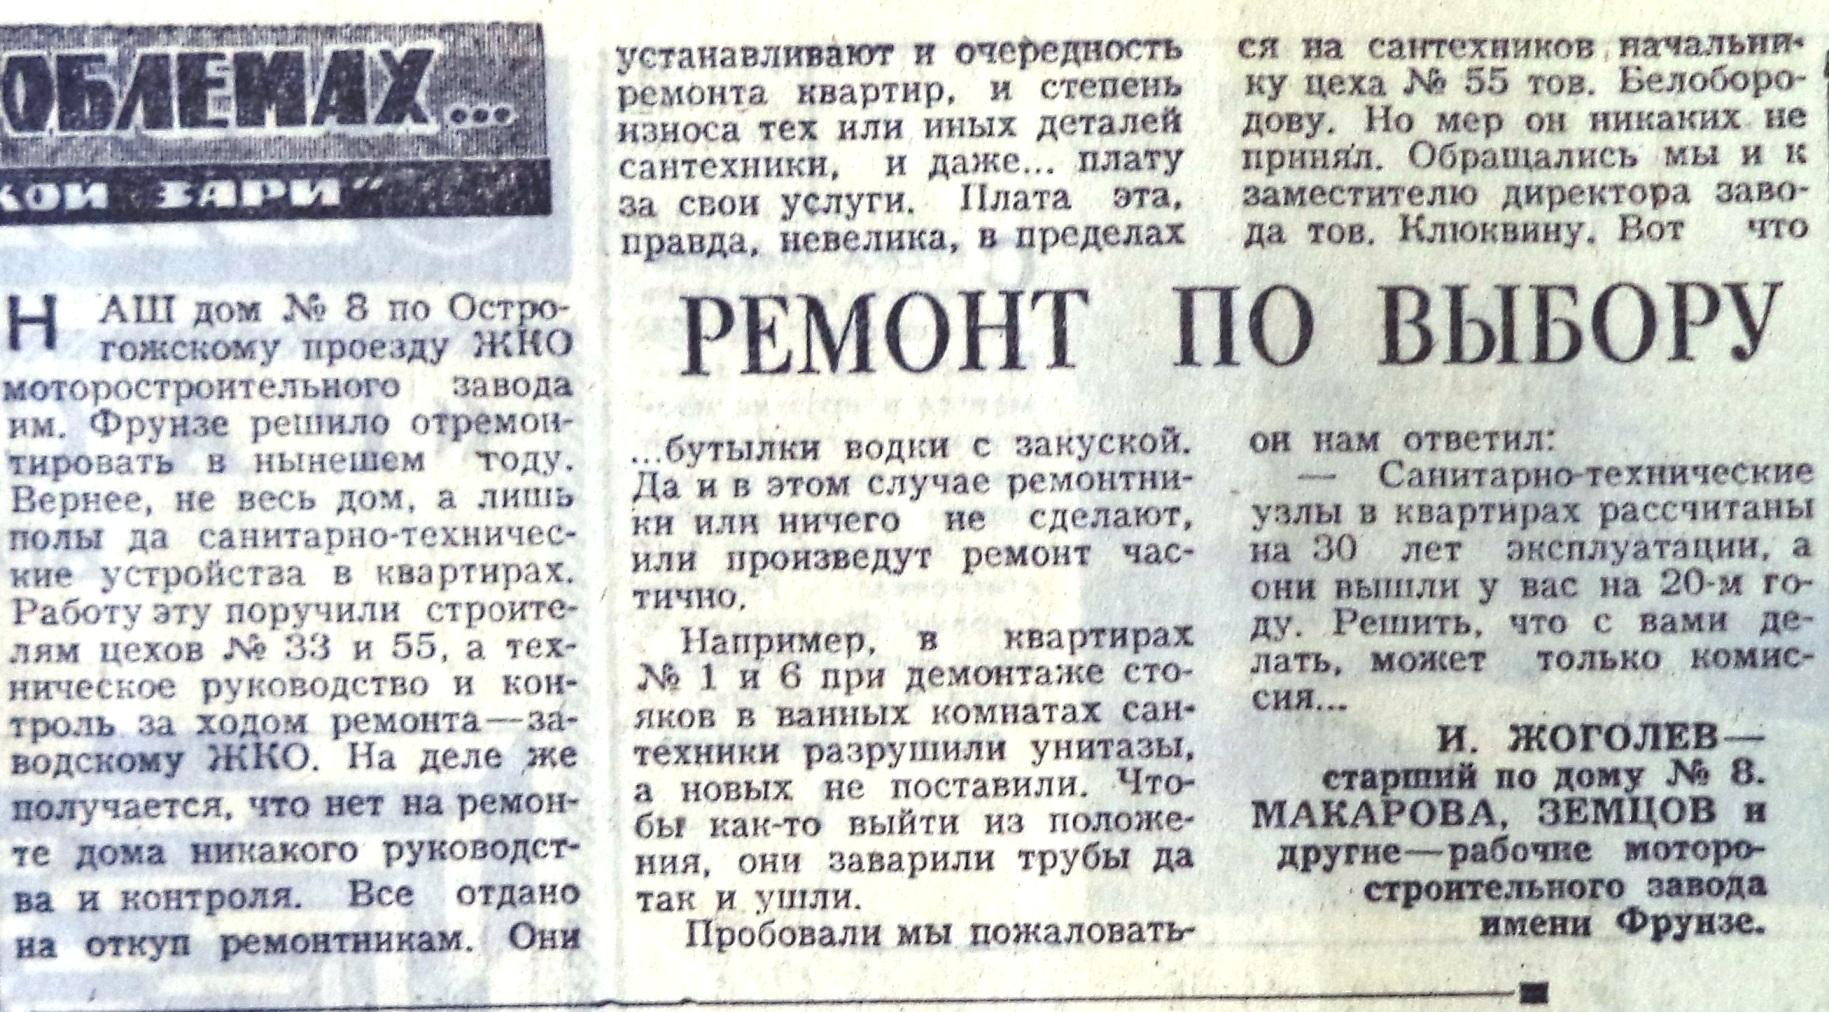 Острогожский-ФОТО-06-ВЗя-1972-03-30-неблаг-во на Острог.